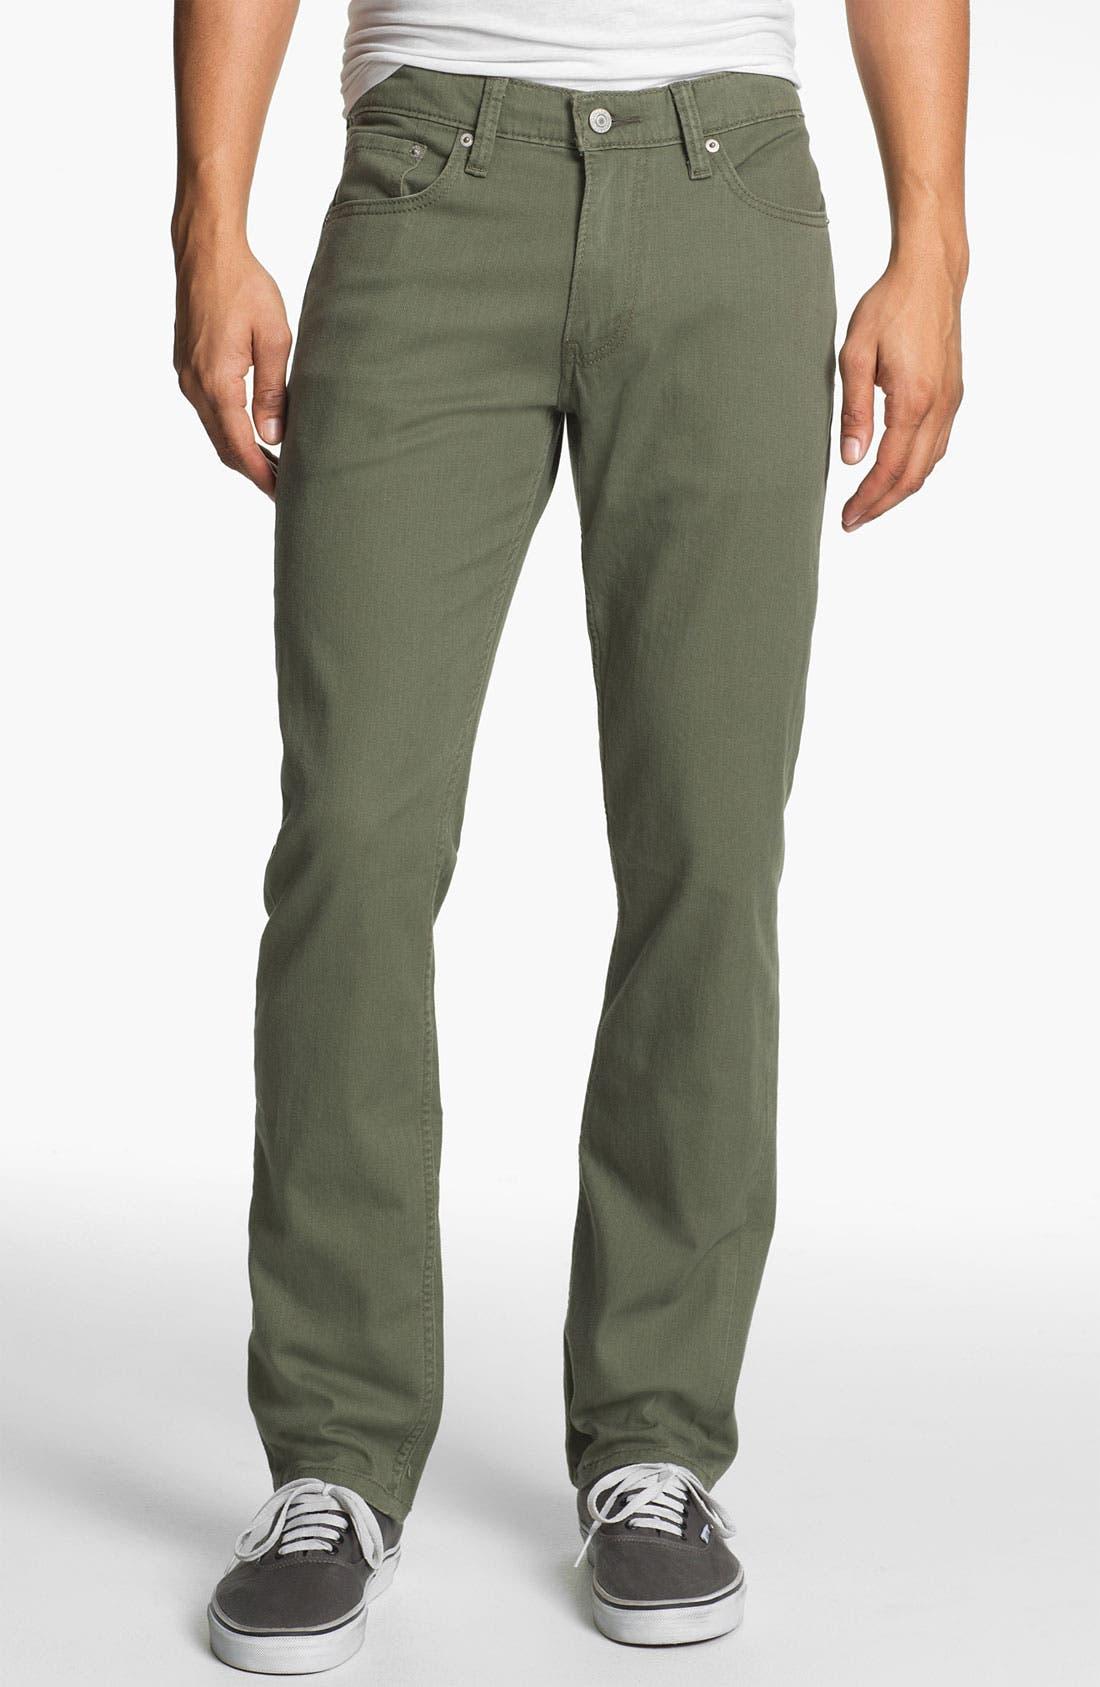 Skinny Leg Pants Men ($ - $): 30 of items - Shop Skinny Leg Pants Men from ALL your favorite stores & find HUGE SAVINGS up to 80% off Skinny Leg Pants Men, including GREAT DEALS like Men's Skinny Casual Pencil Dress Pants Slim Straight-Leg Leisure Trousers ($).